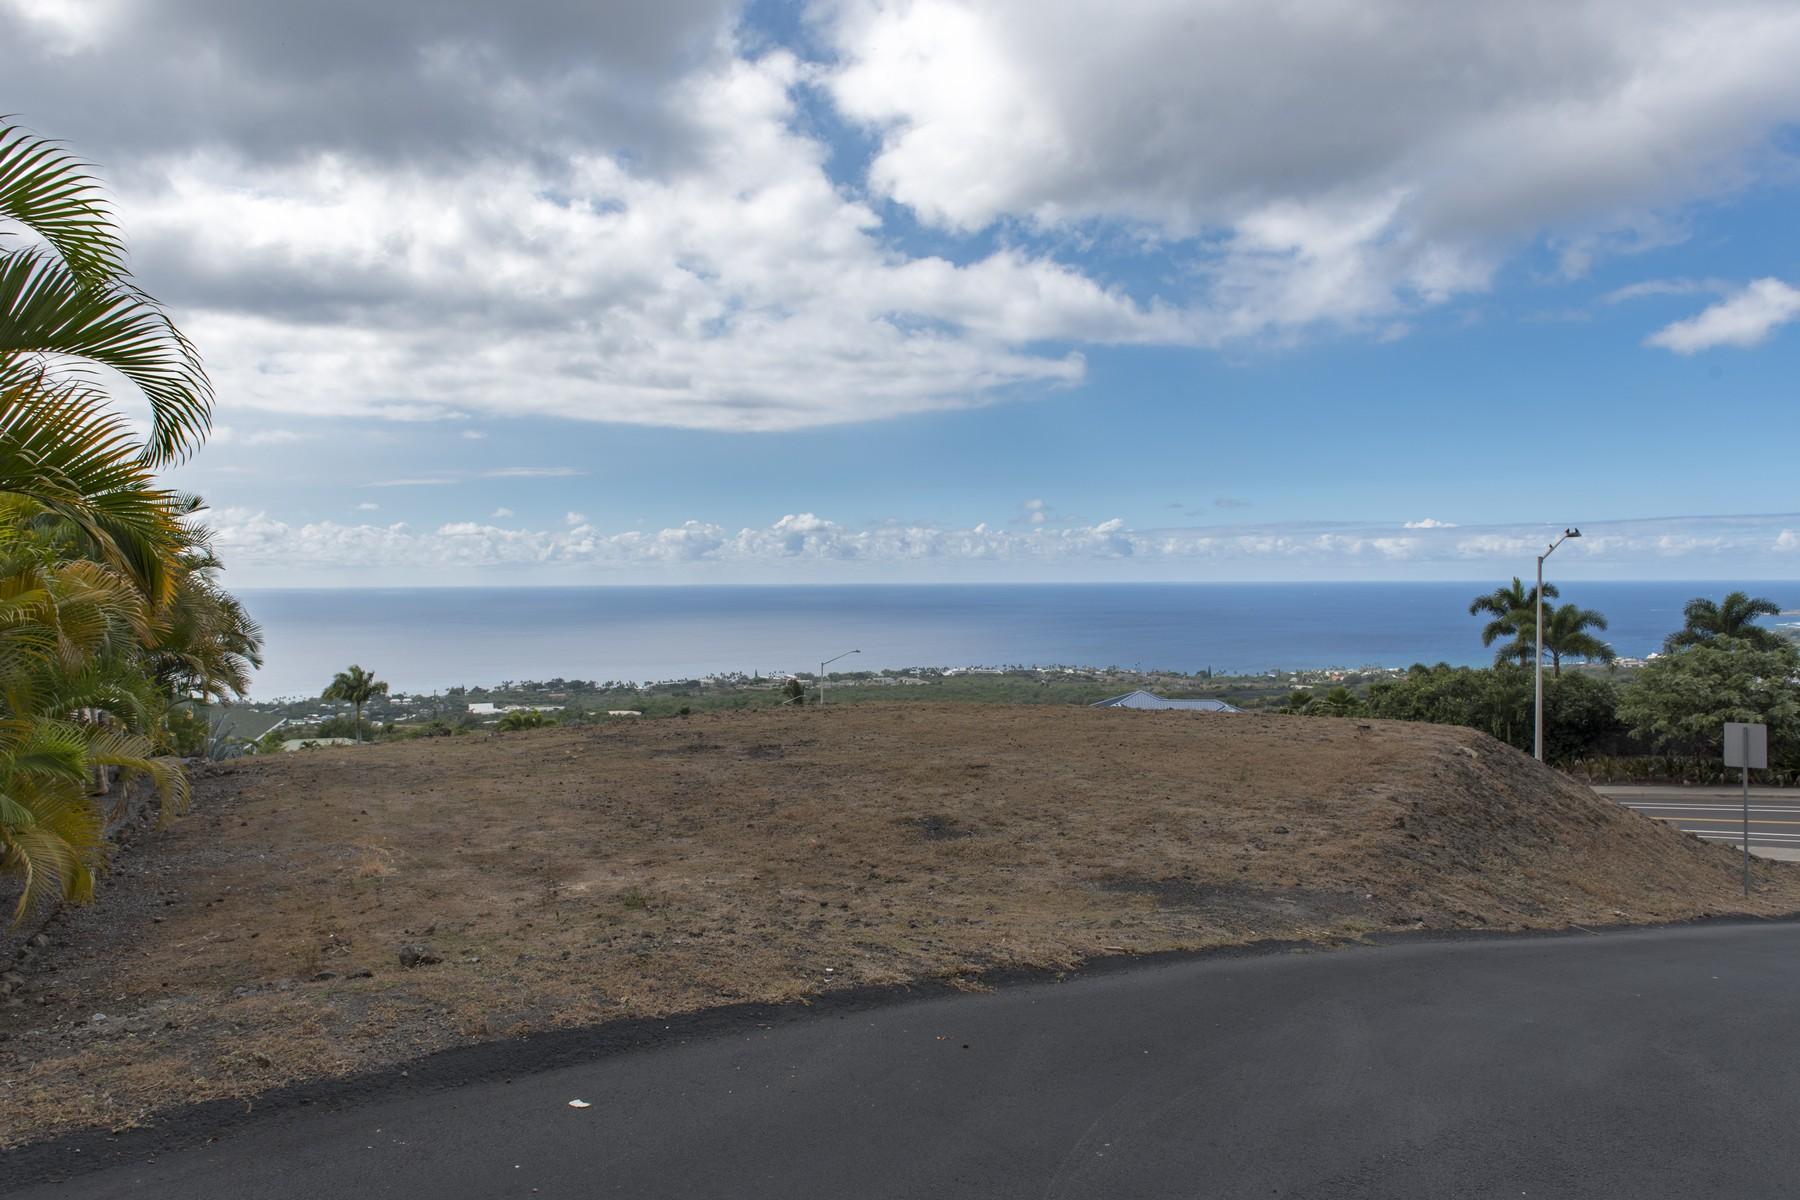 Land for Sale at Heights at Hualalai Koiula Pl, Kailua-Kona, Hawaii, 96740 United States